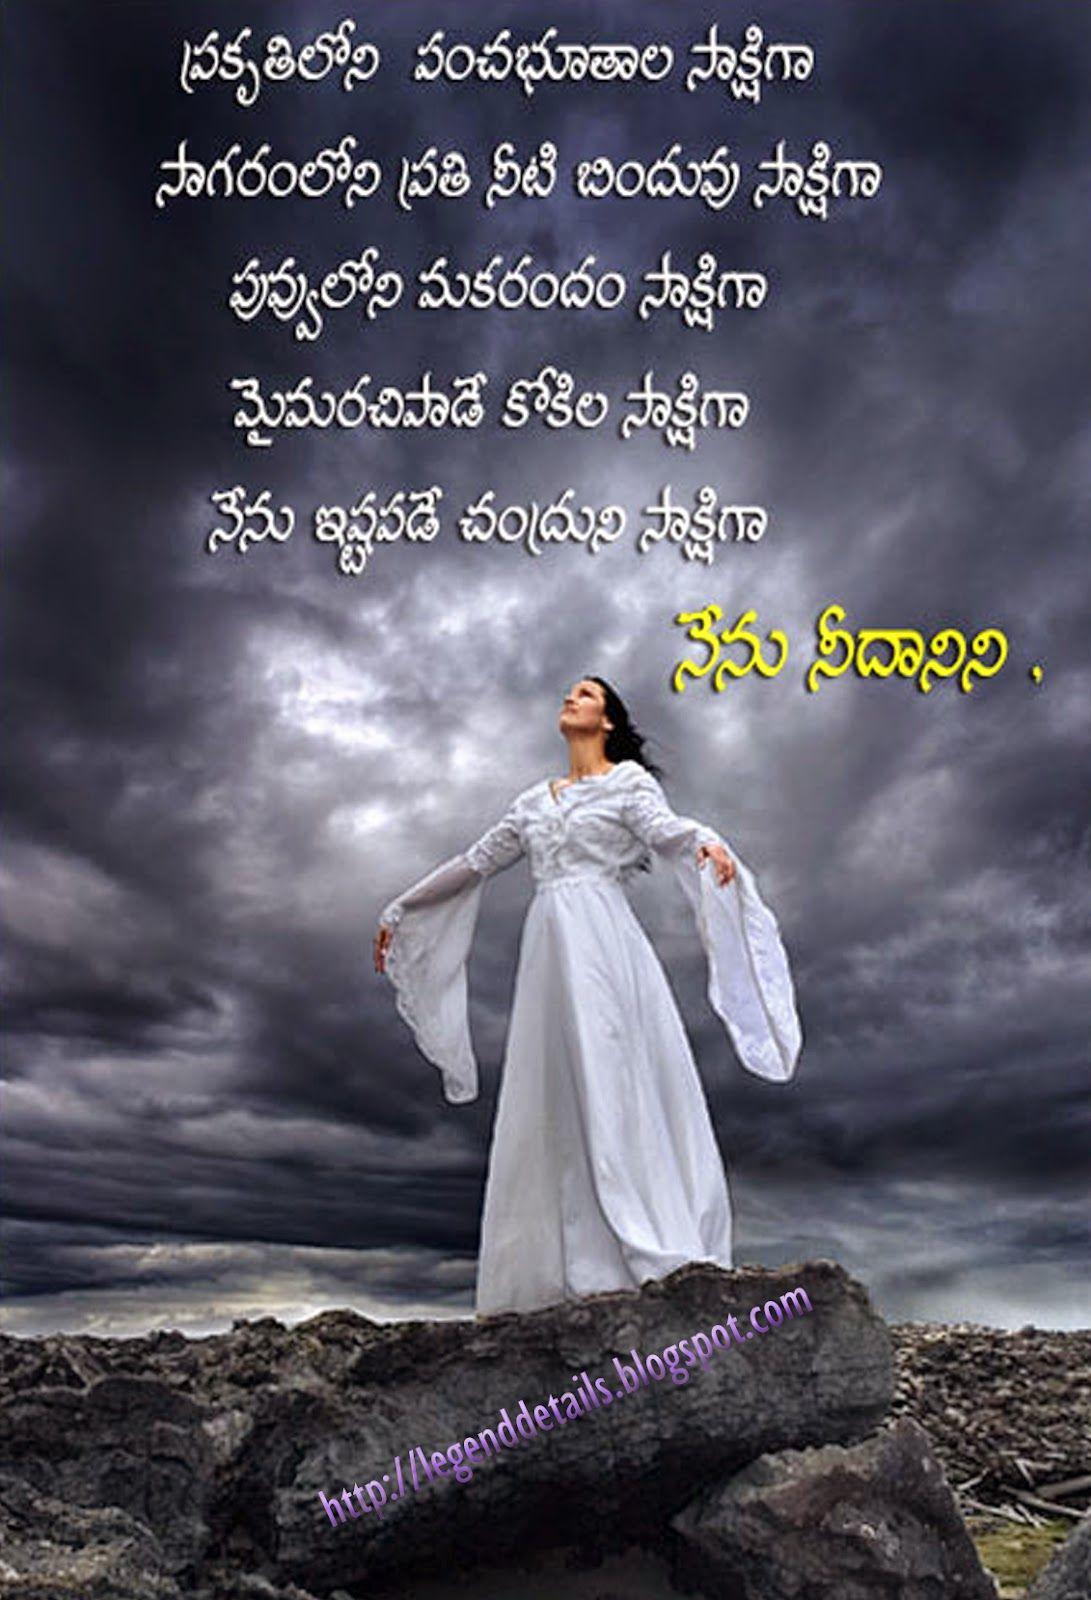 Love Quotes For Boyfriend In Telugu Whr3kzbte In Love Quotes